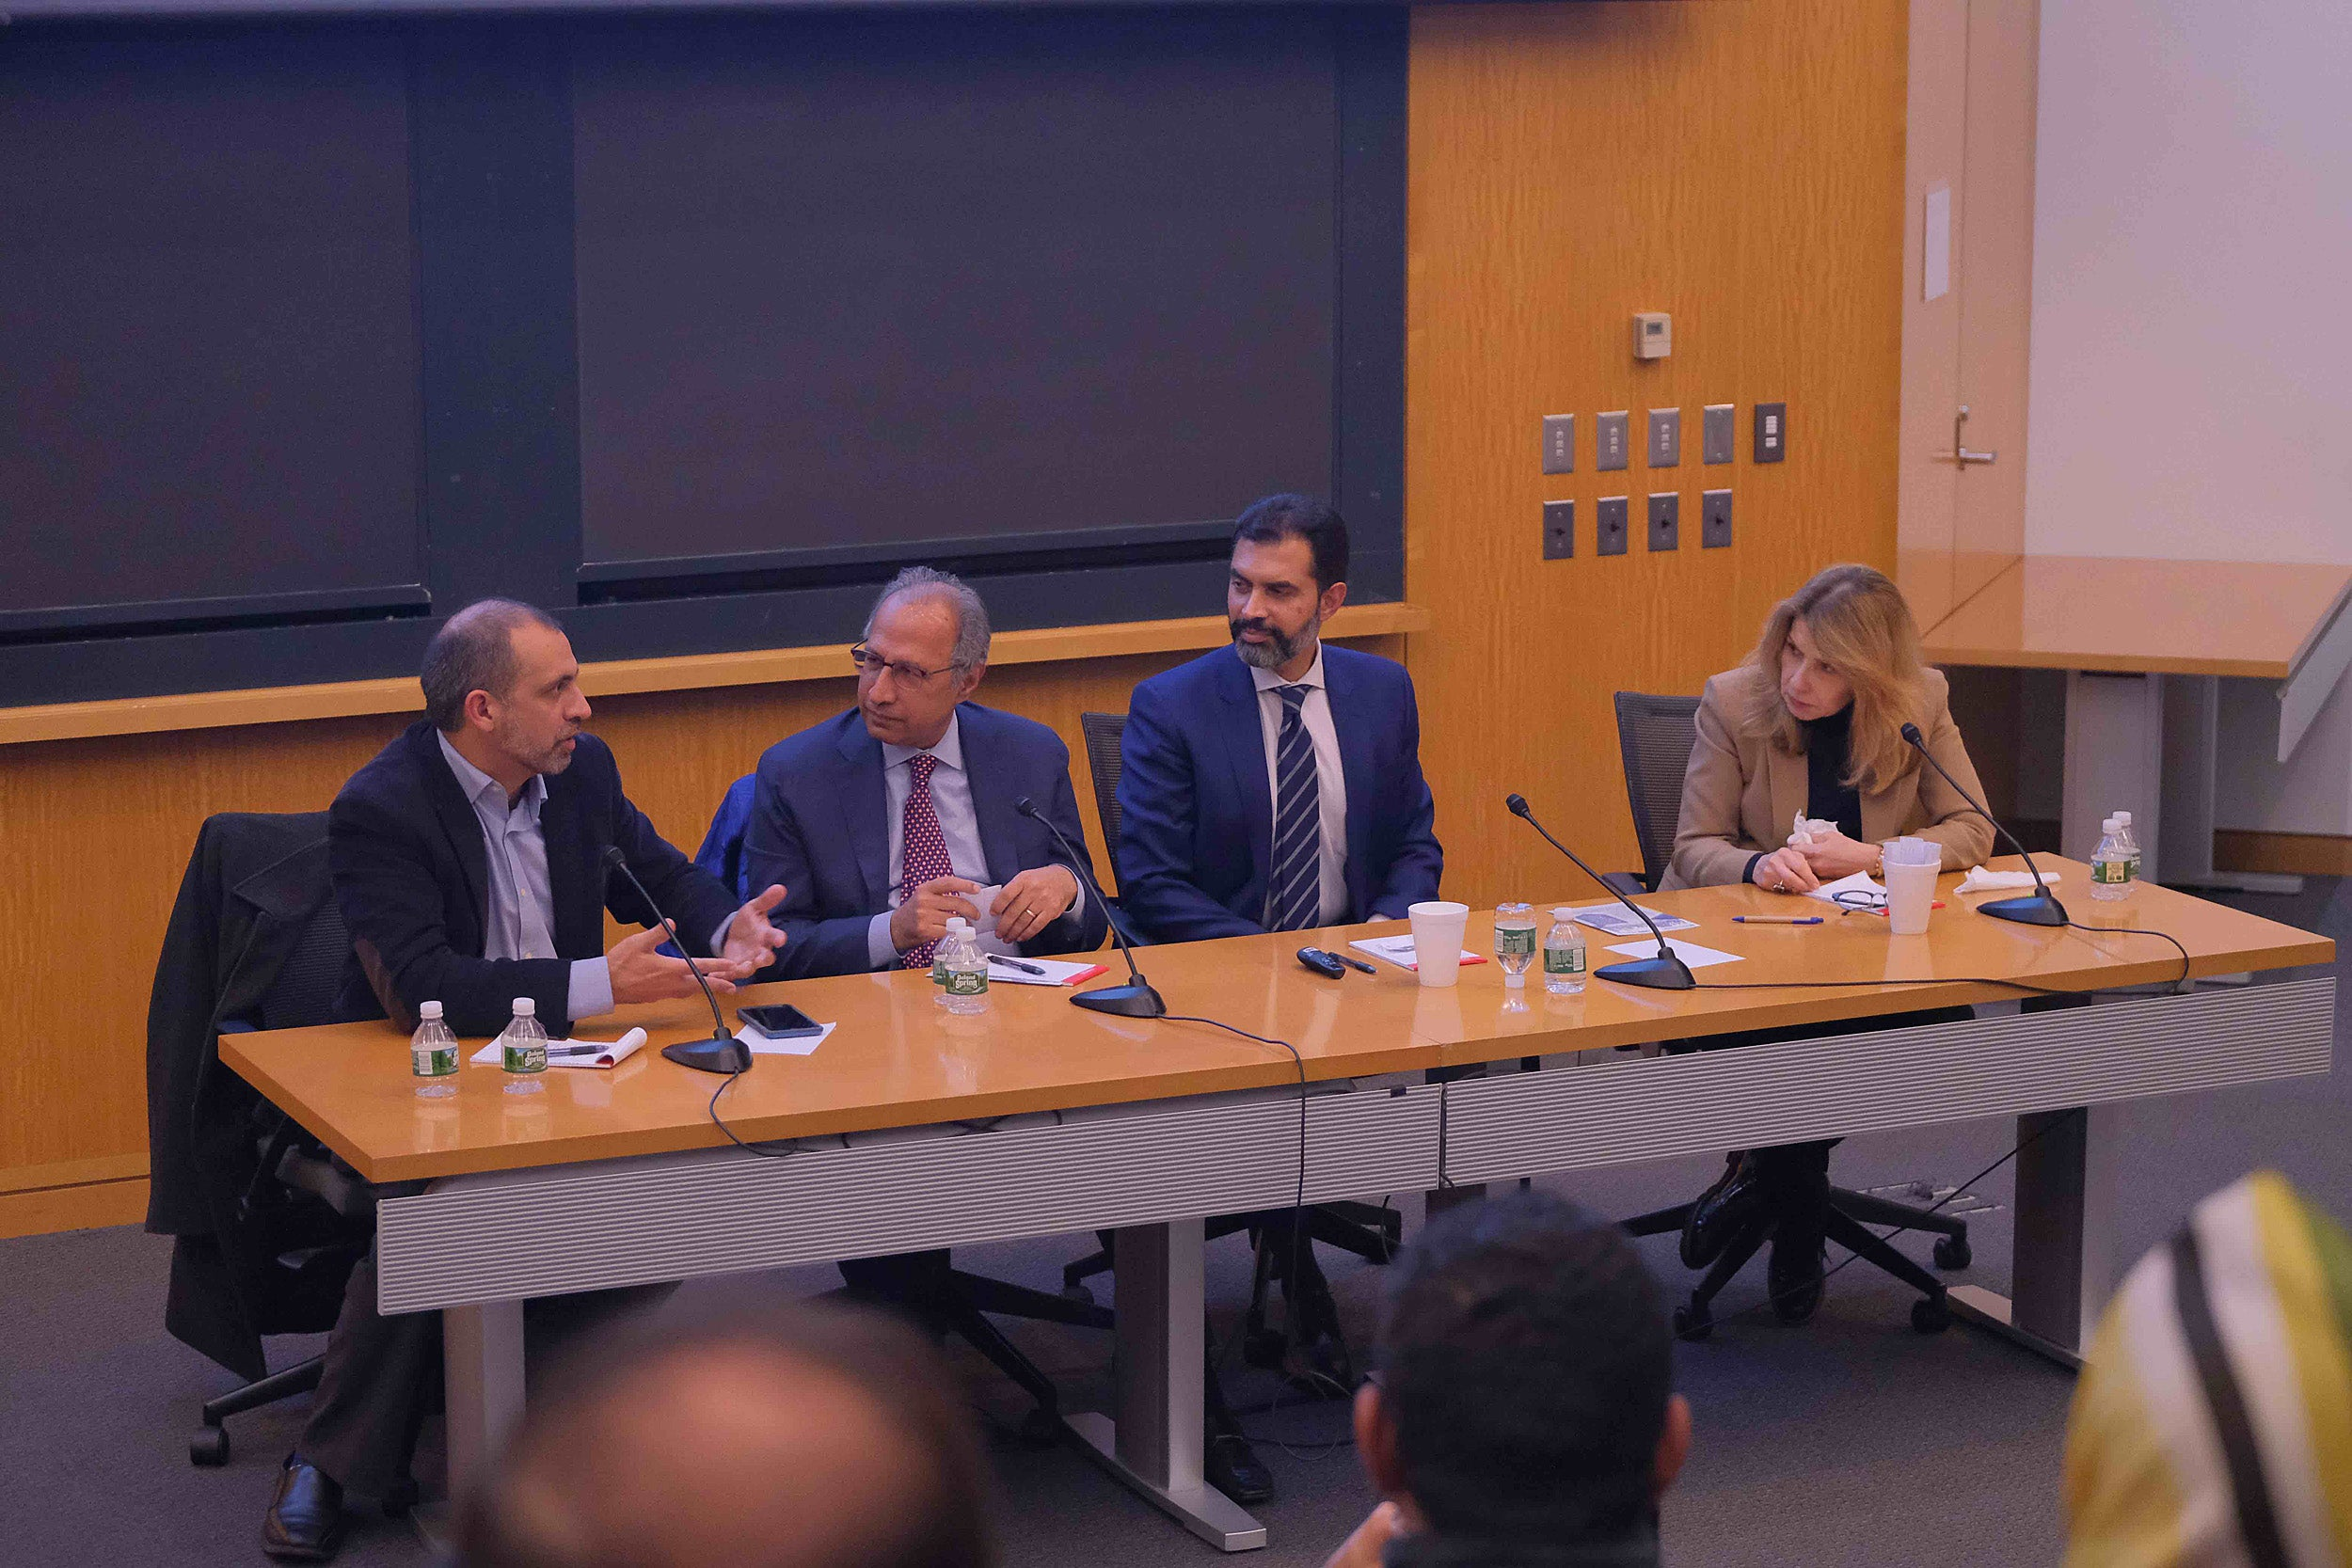 Four panel members speaking